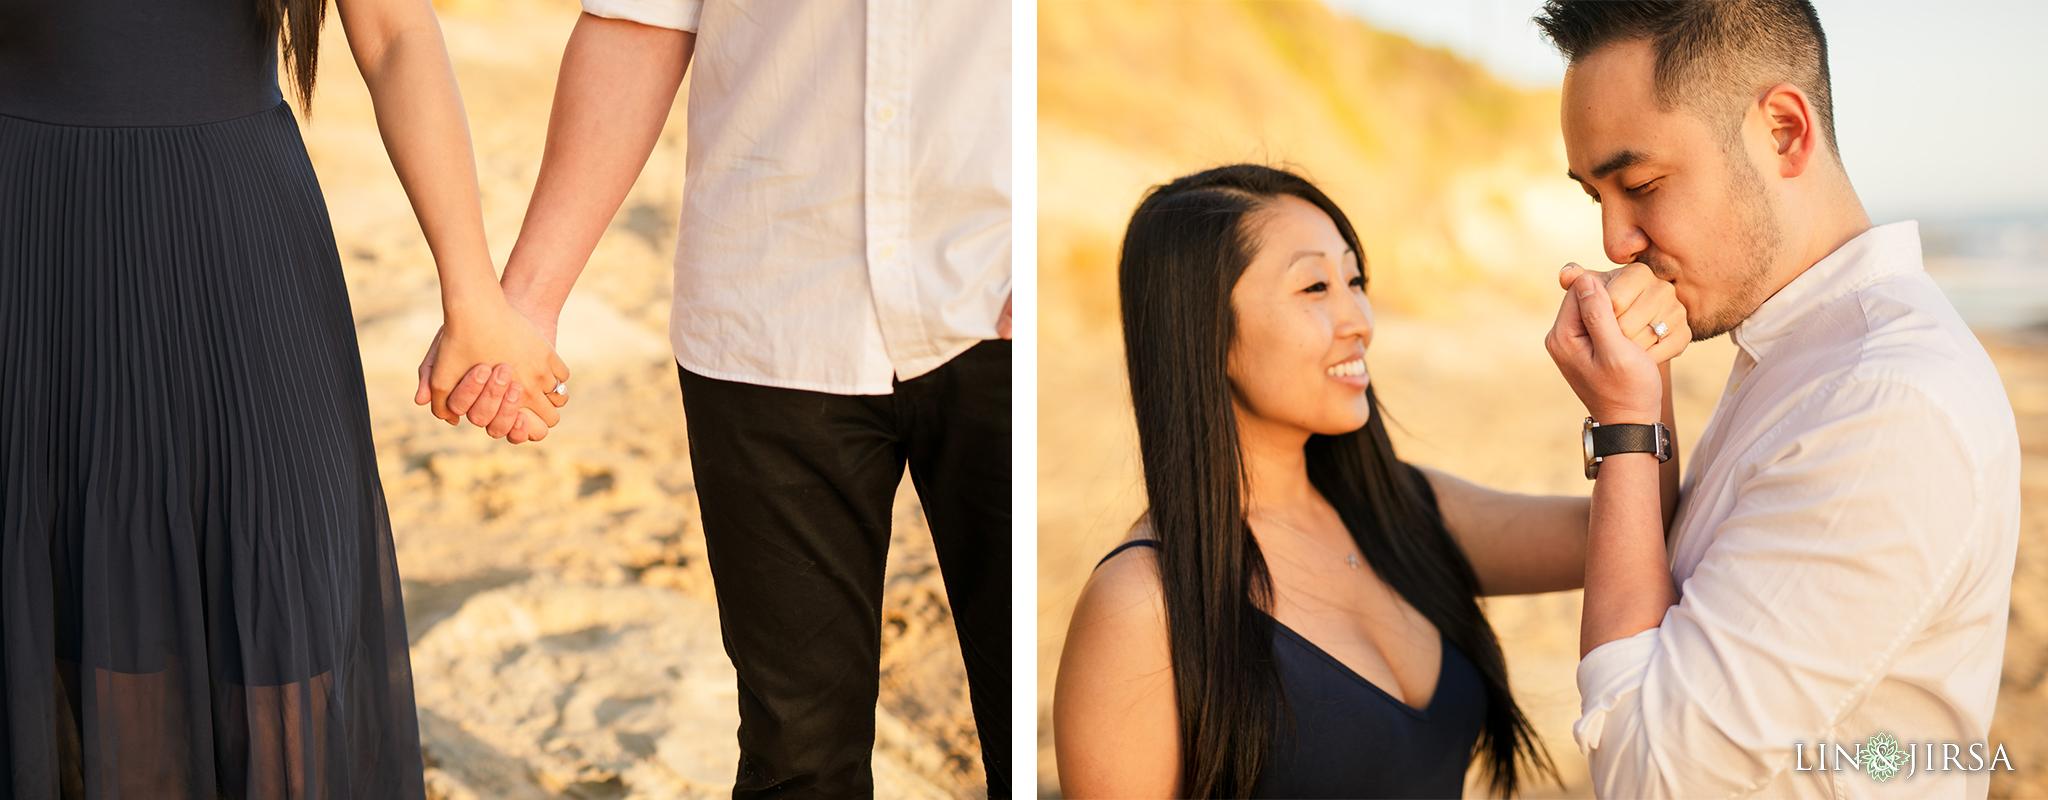 09 Heisler Beach Orange County Proposal Engagement Photography